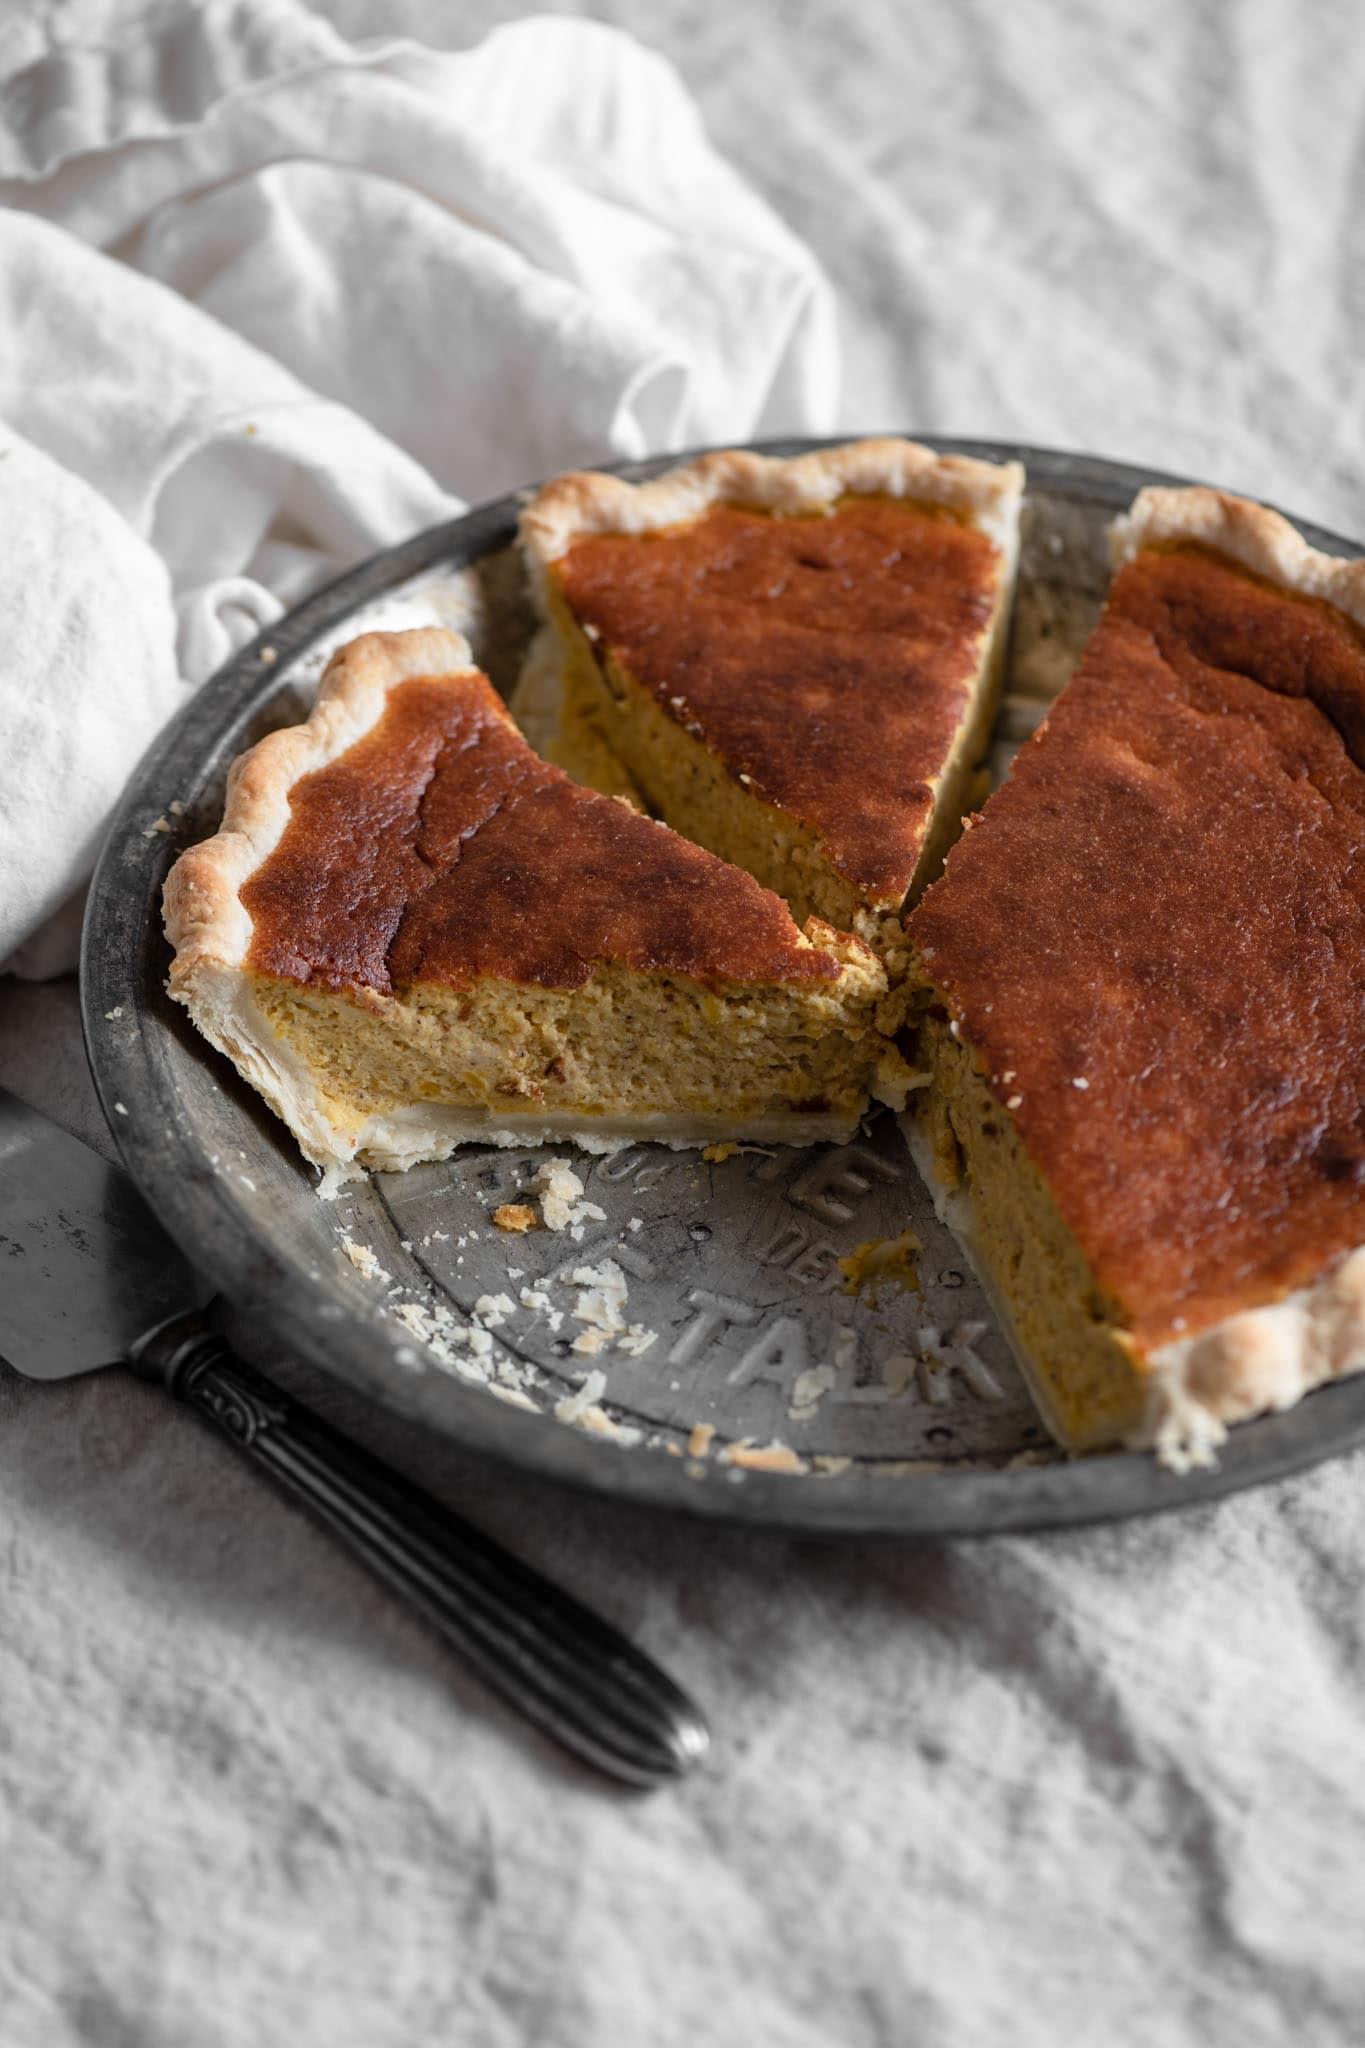 homemade pumpkin pie recipe with fresh pumpkin puree